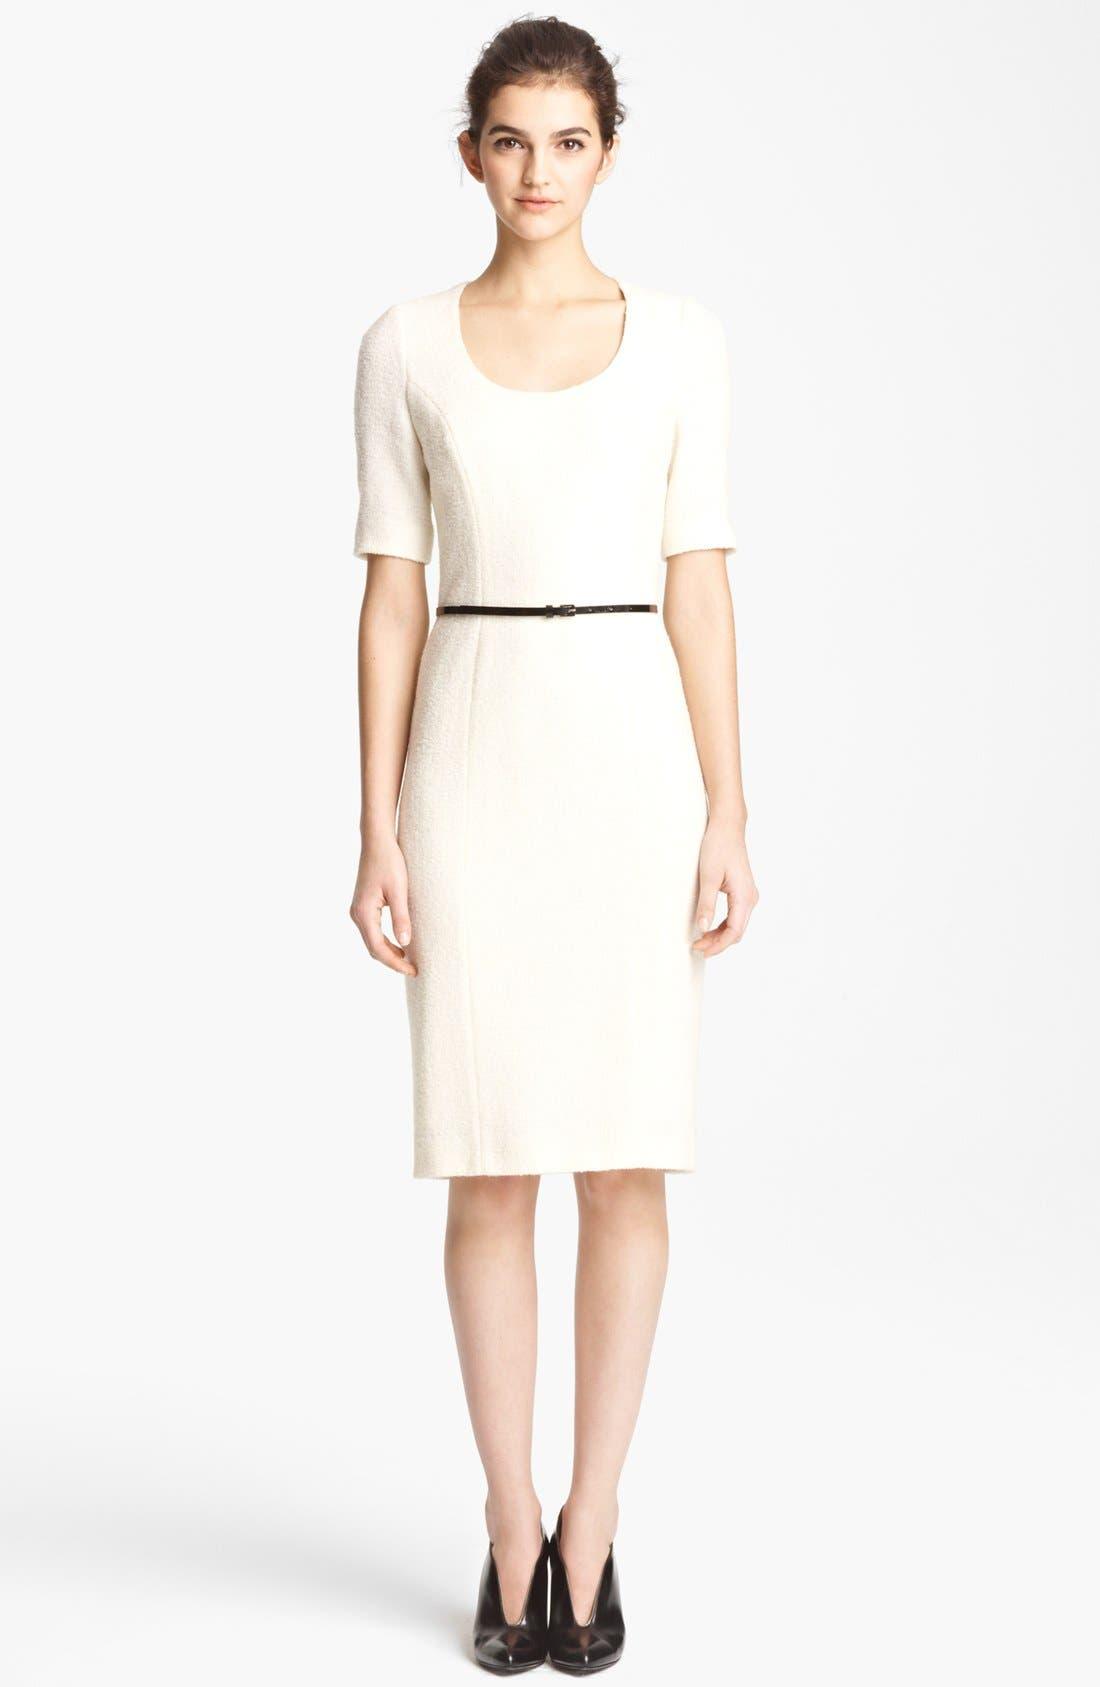 Main Image - Moschino Cheap & Chic Dress & Accessories